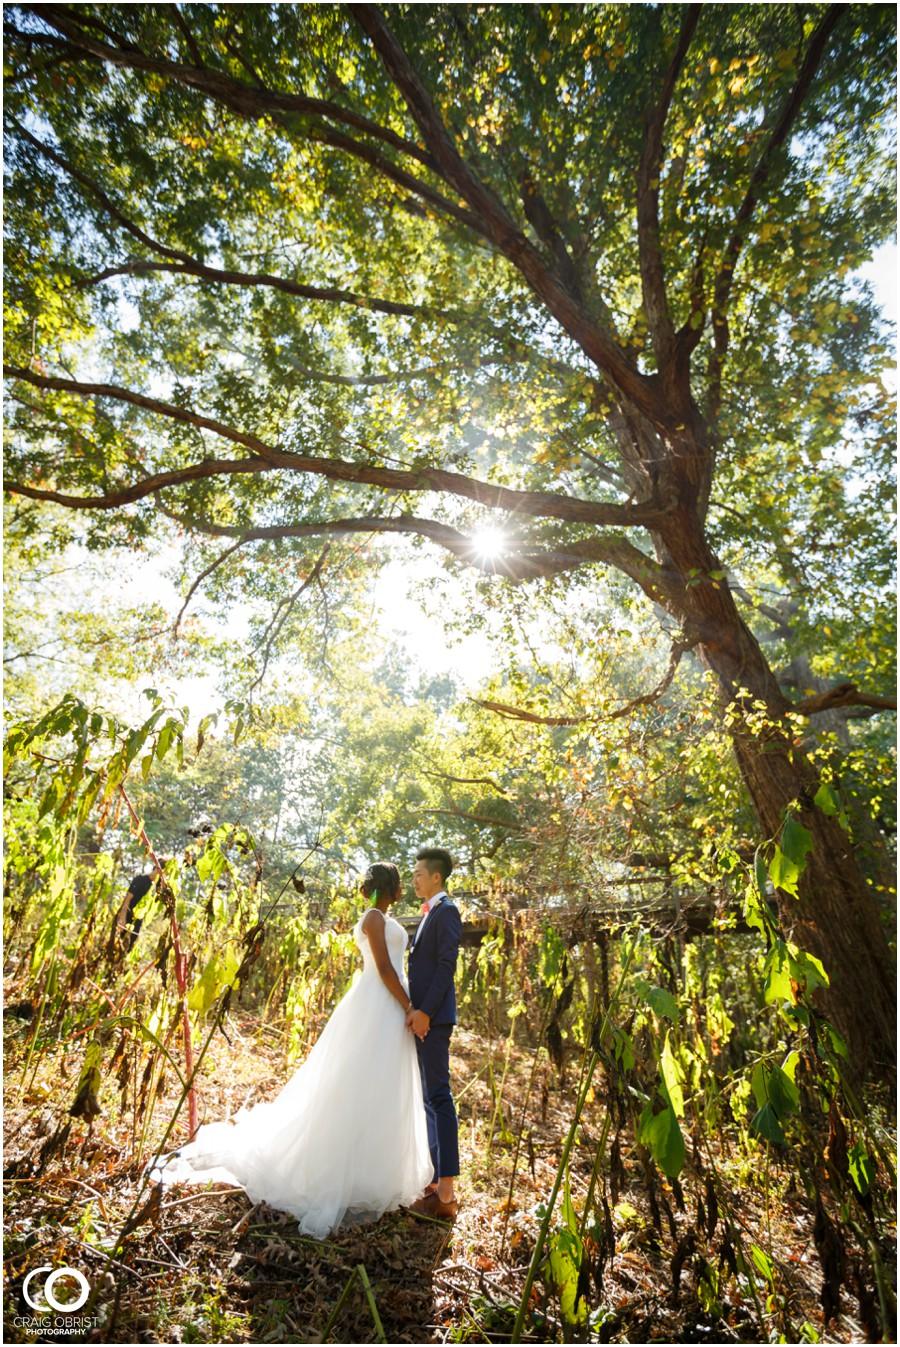 Atrium Norcross McDaniel Farm Park Wedding_0031.jpg